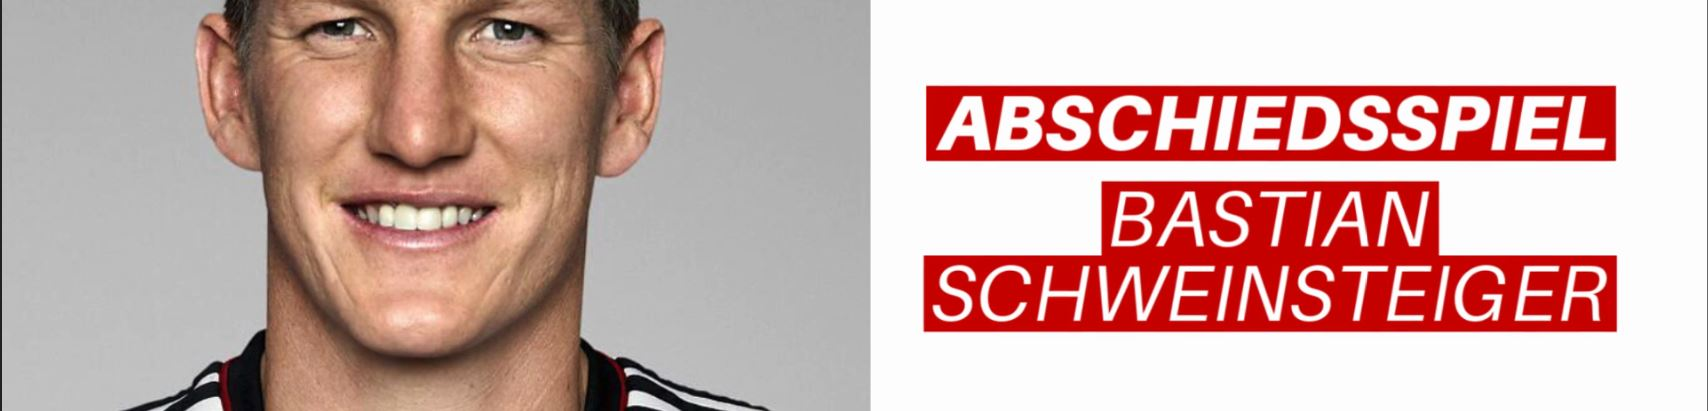 Bastian Schweinsteiger Abschiedsspiel